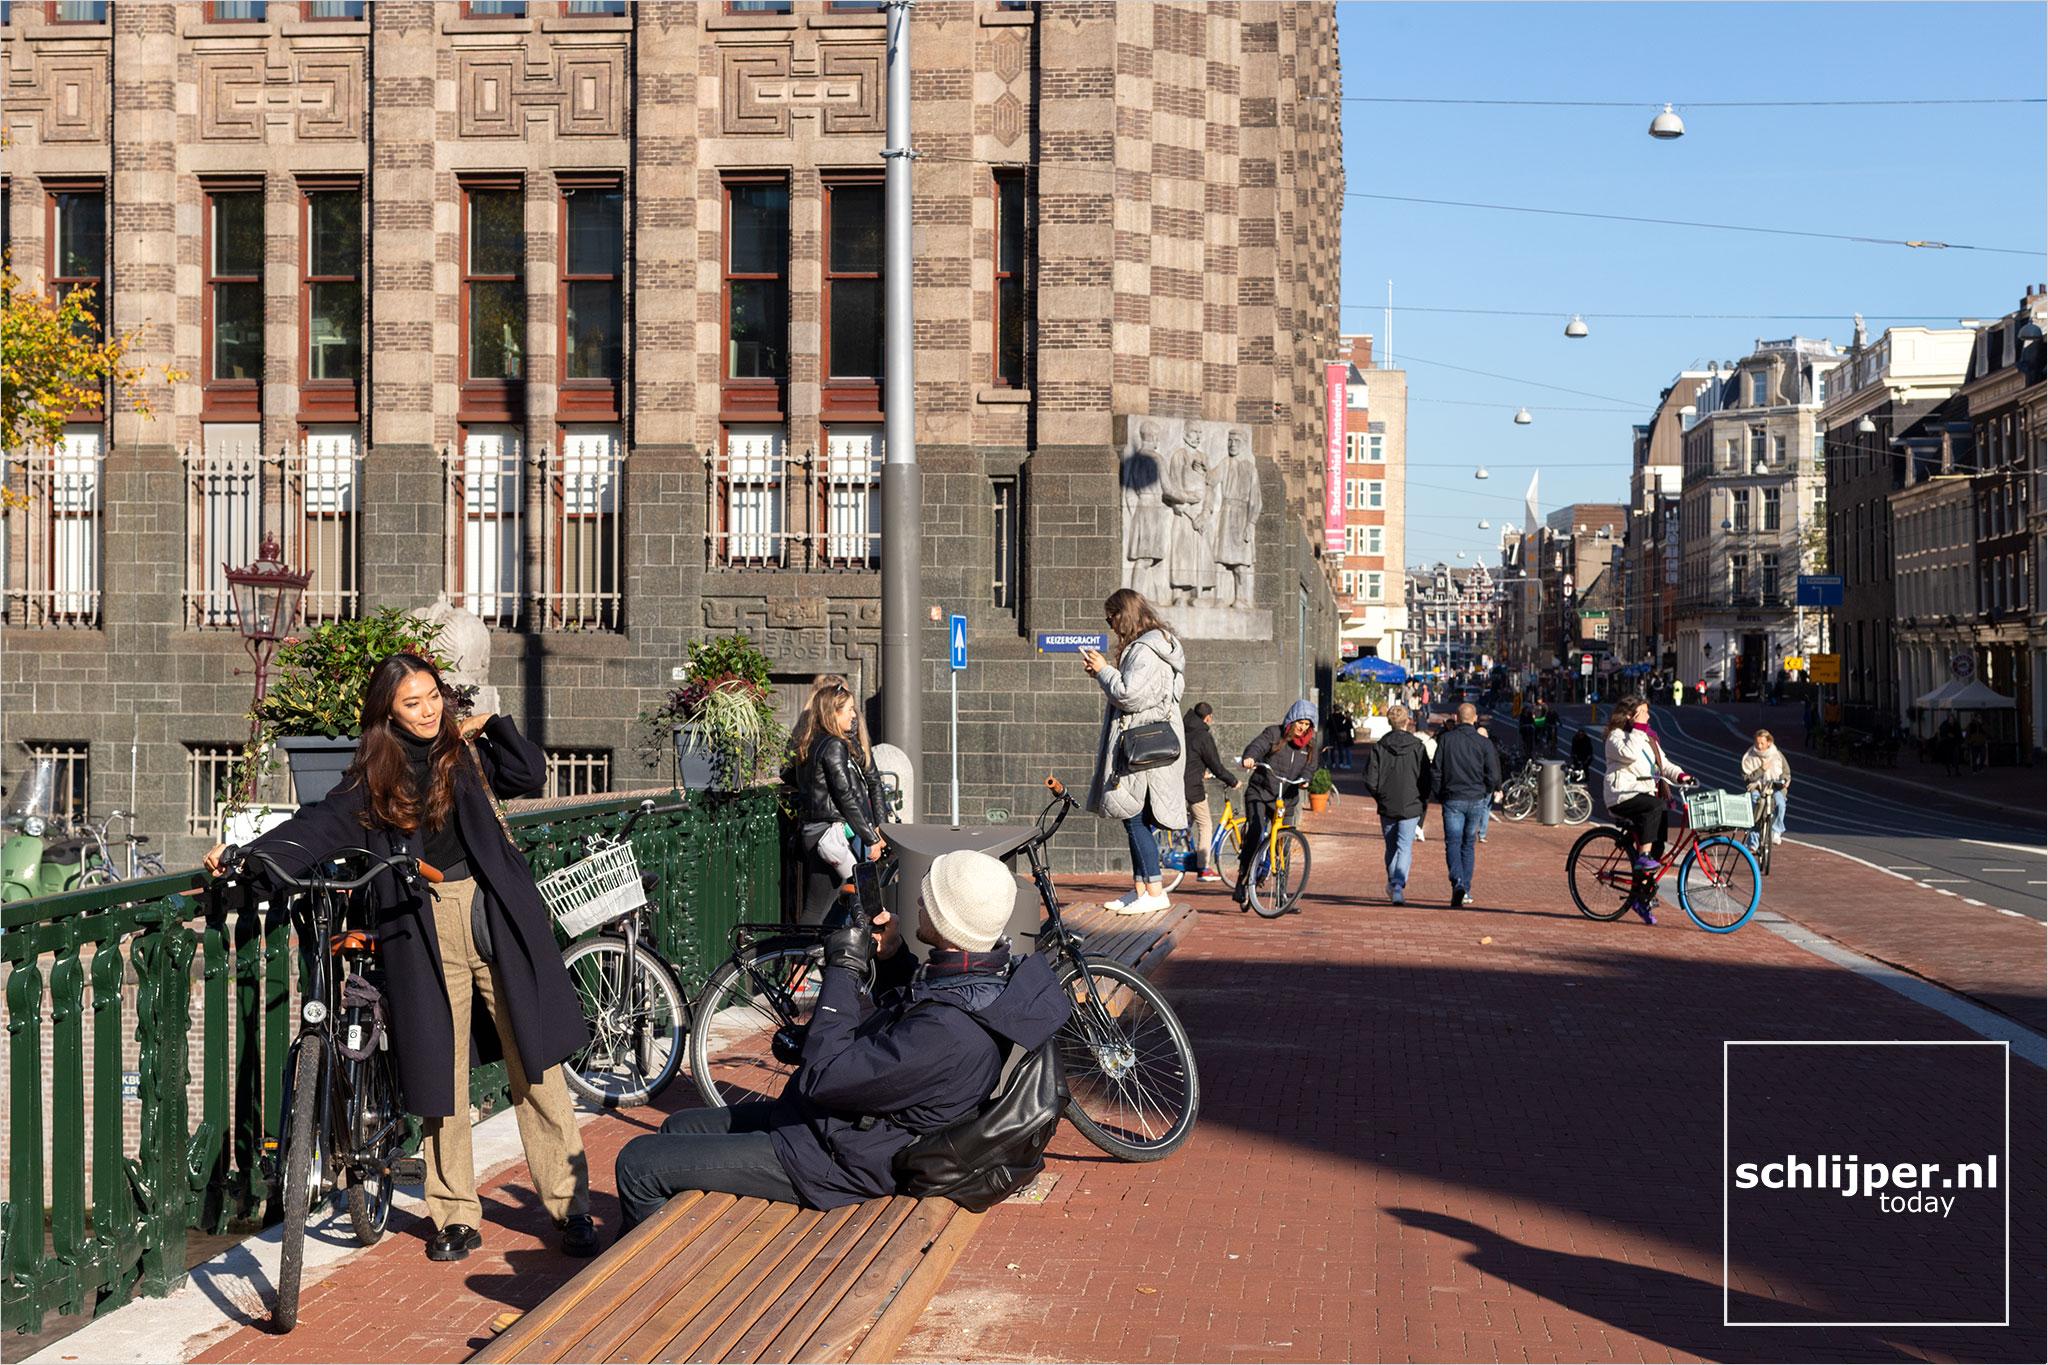 The Netherlands, Amsterdam, 24 oktober 2021